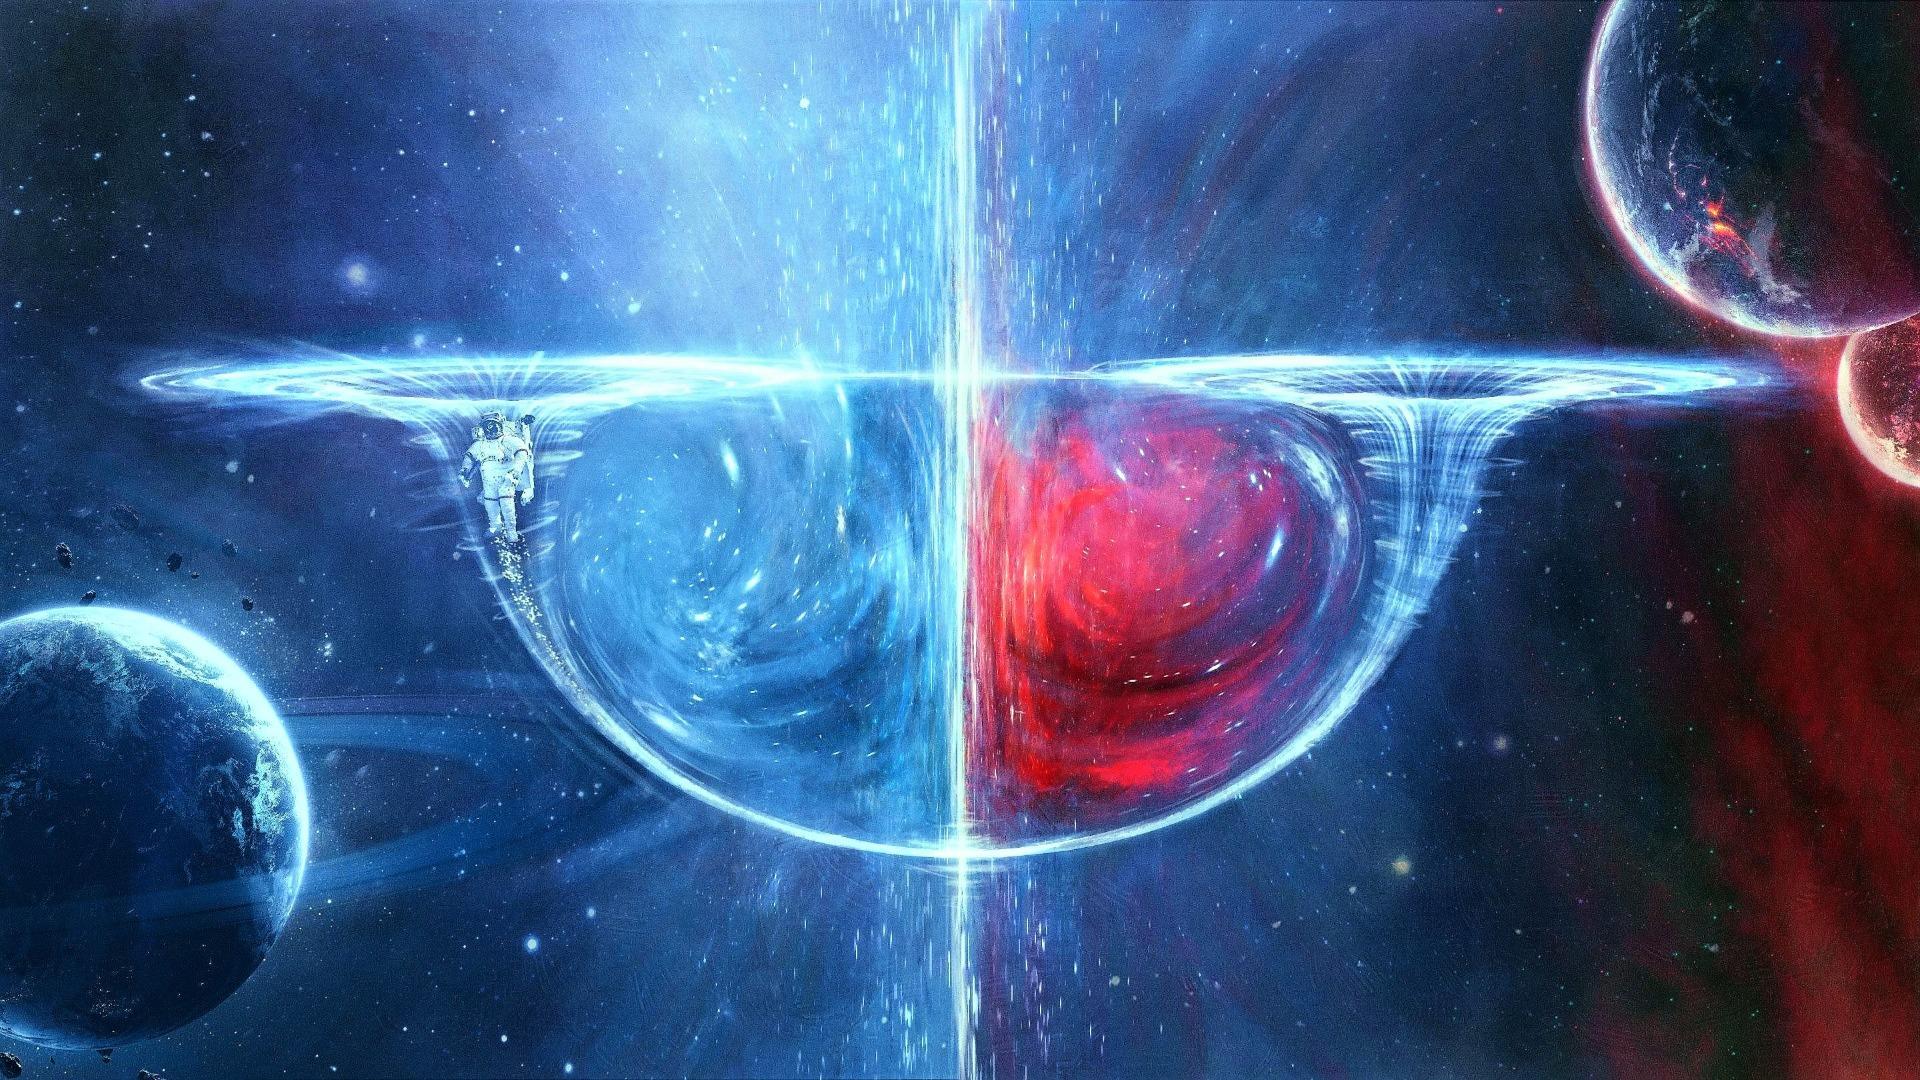 Wormhole simulation wallpaper